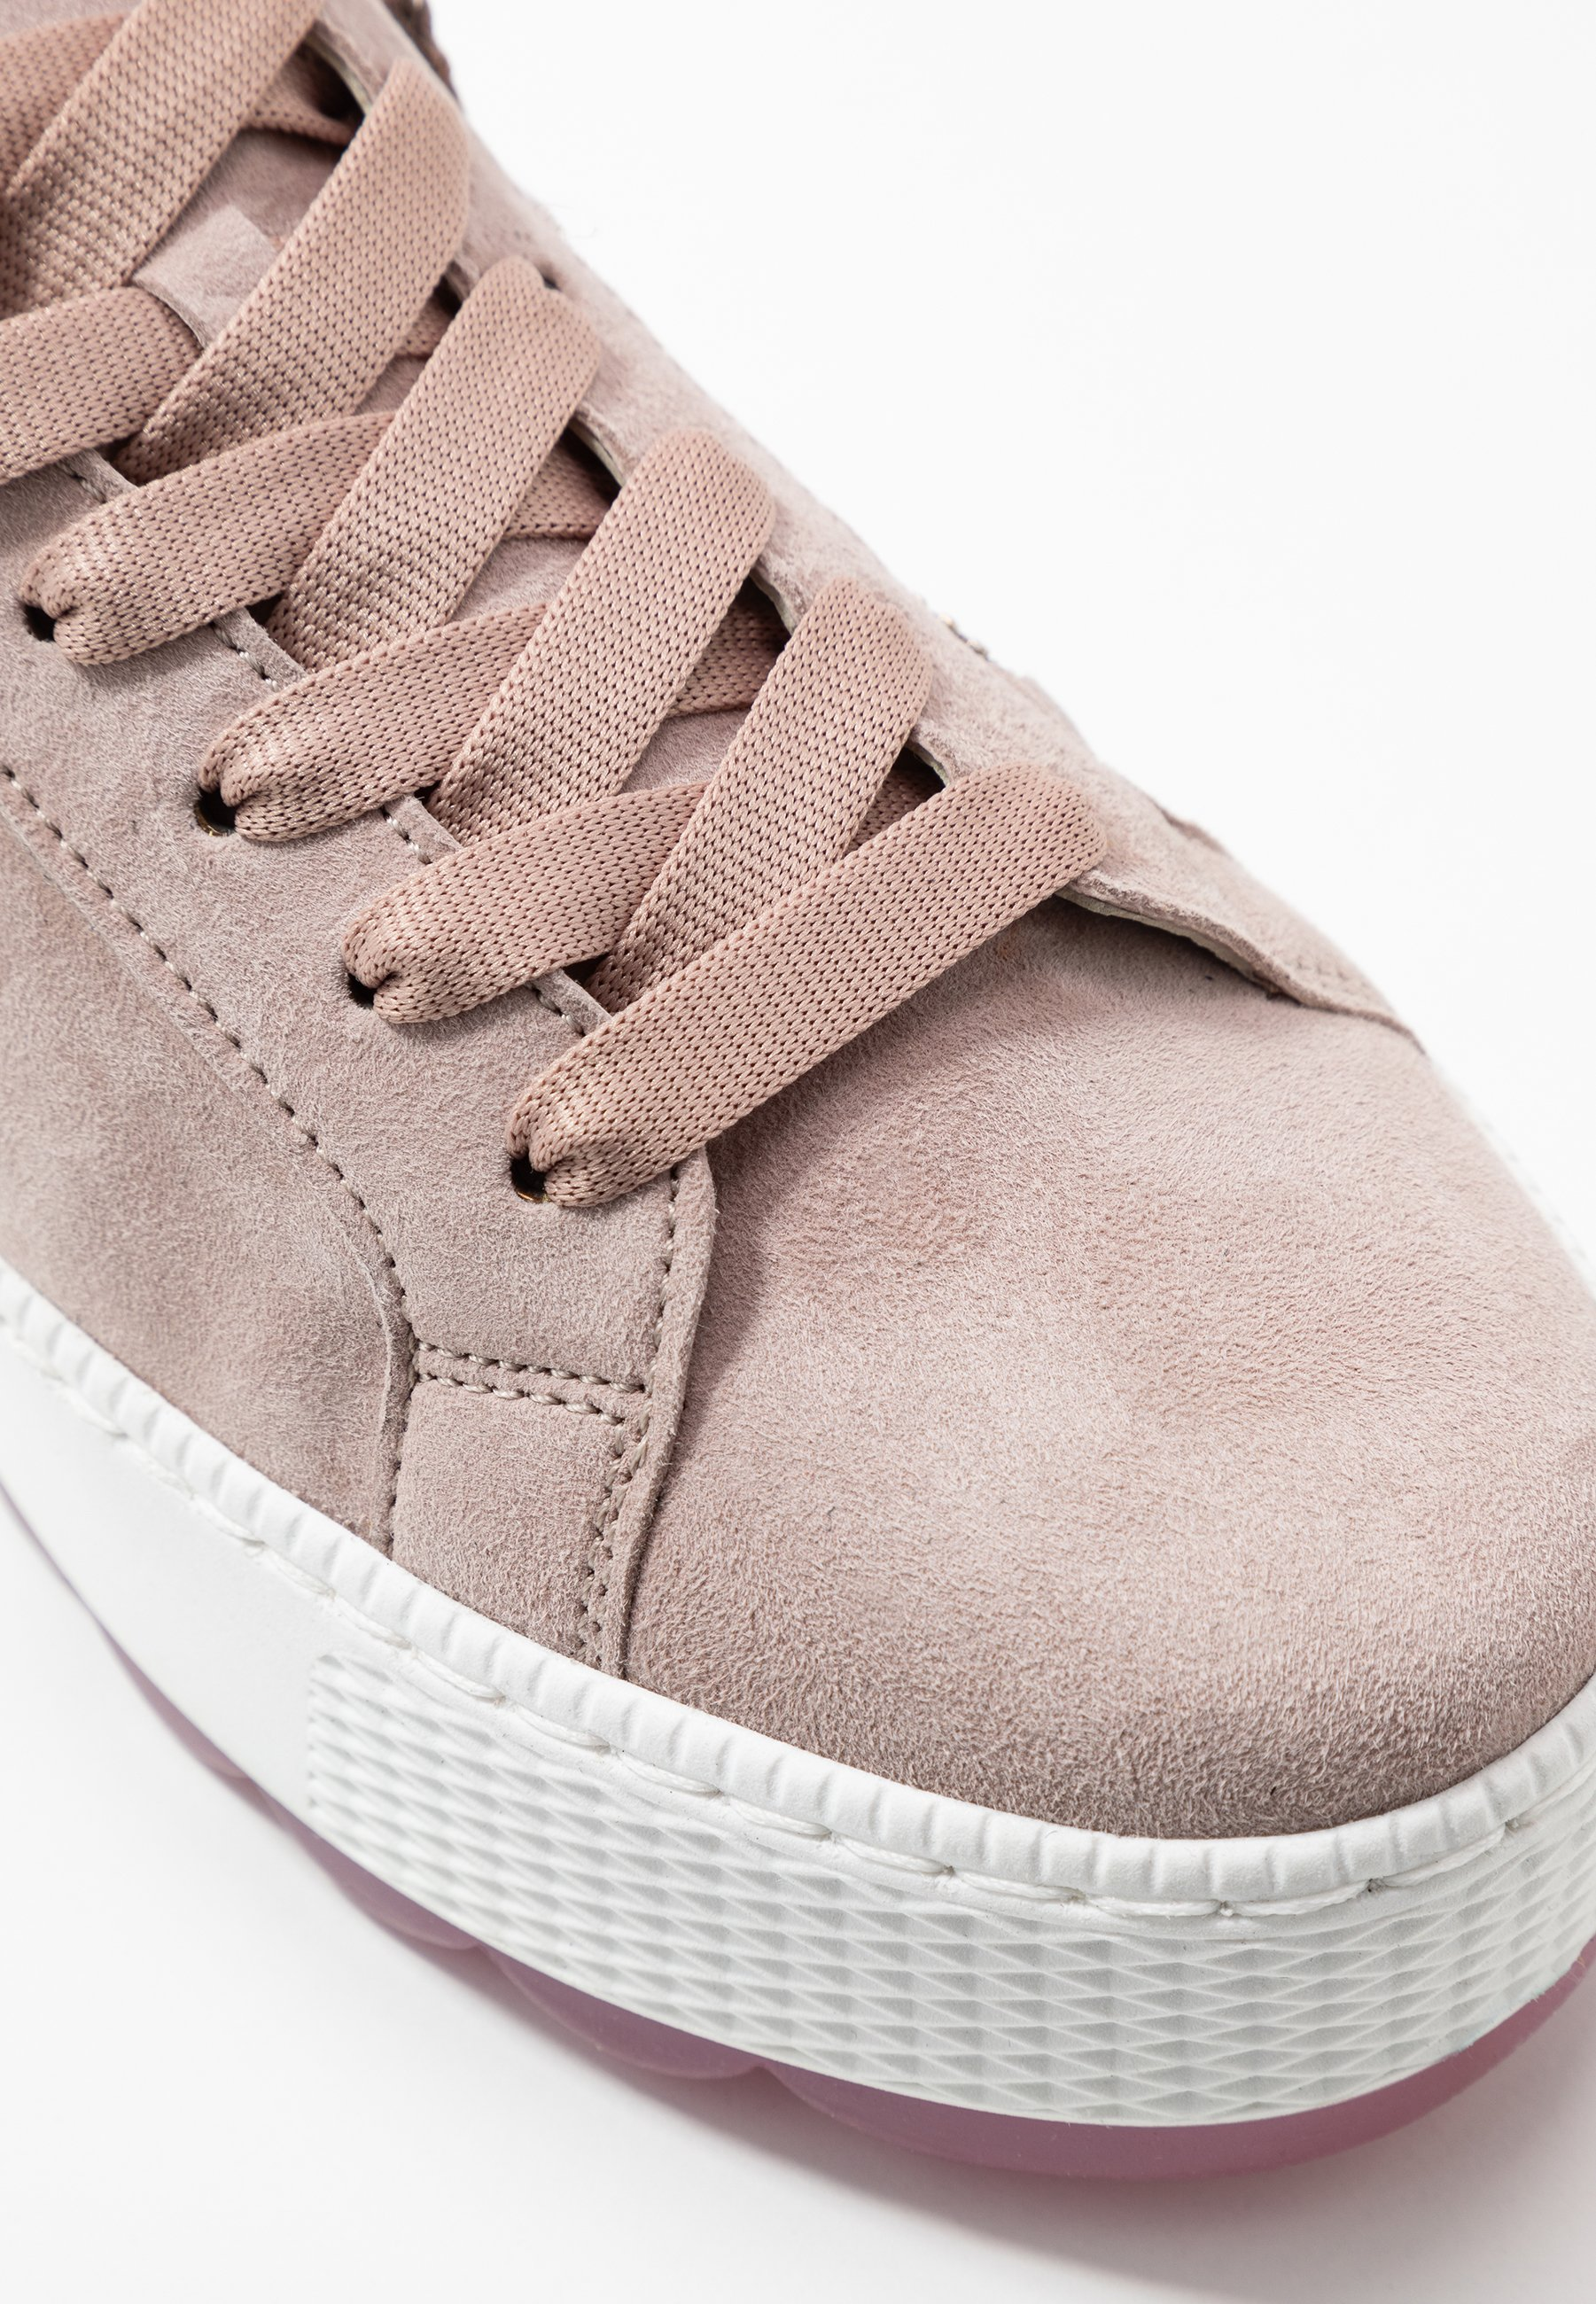 Gabor Comfort Sneaker Low - Antikrosa/weiß Black Friday